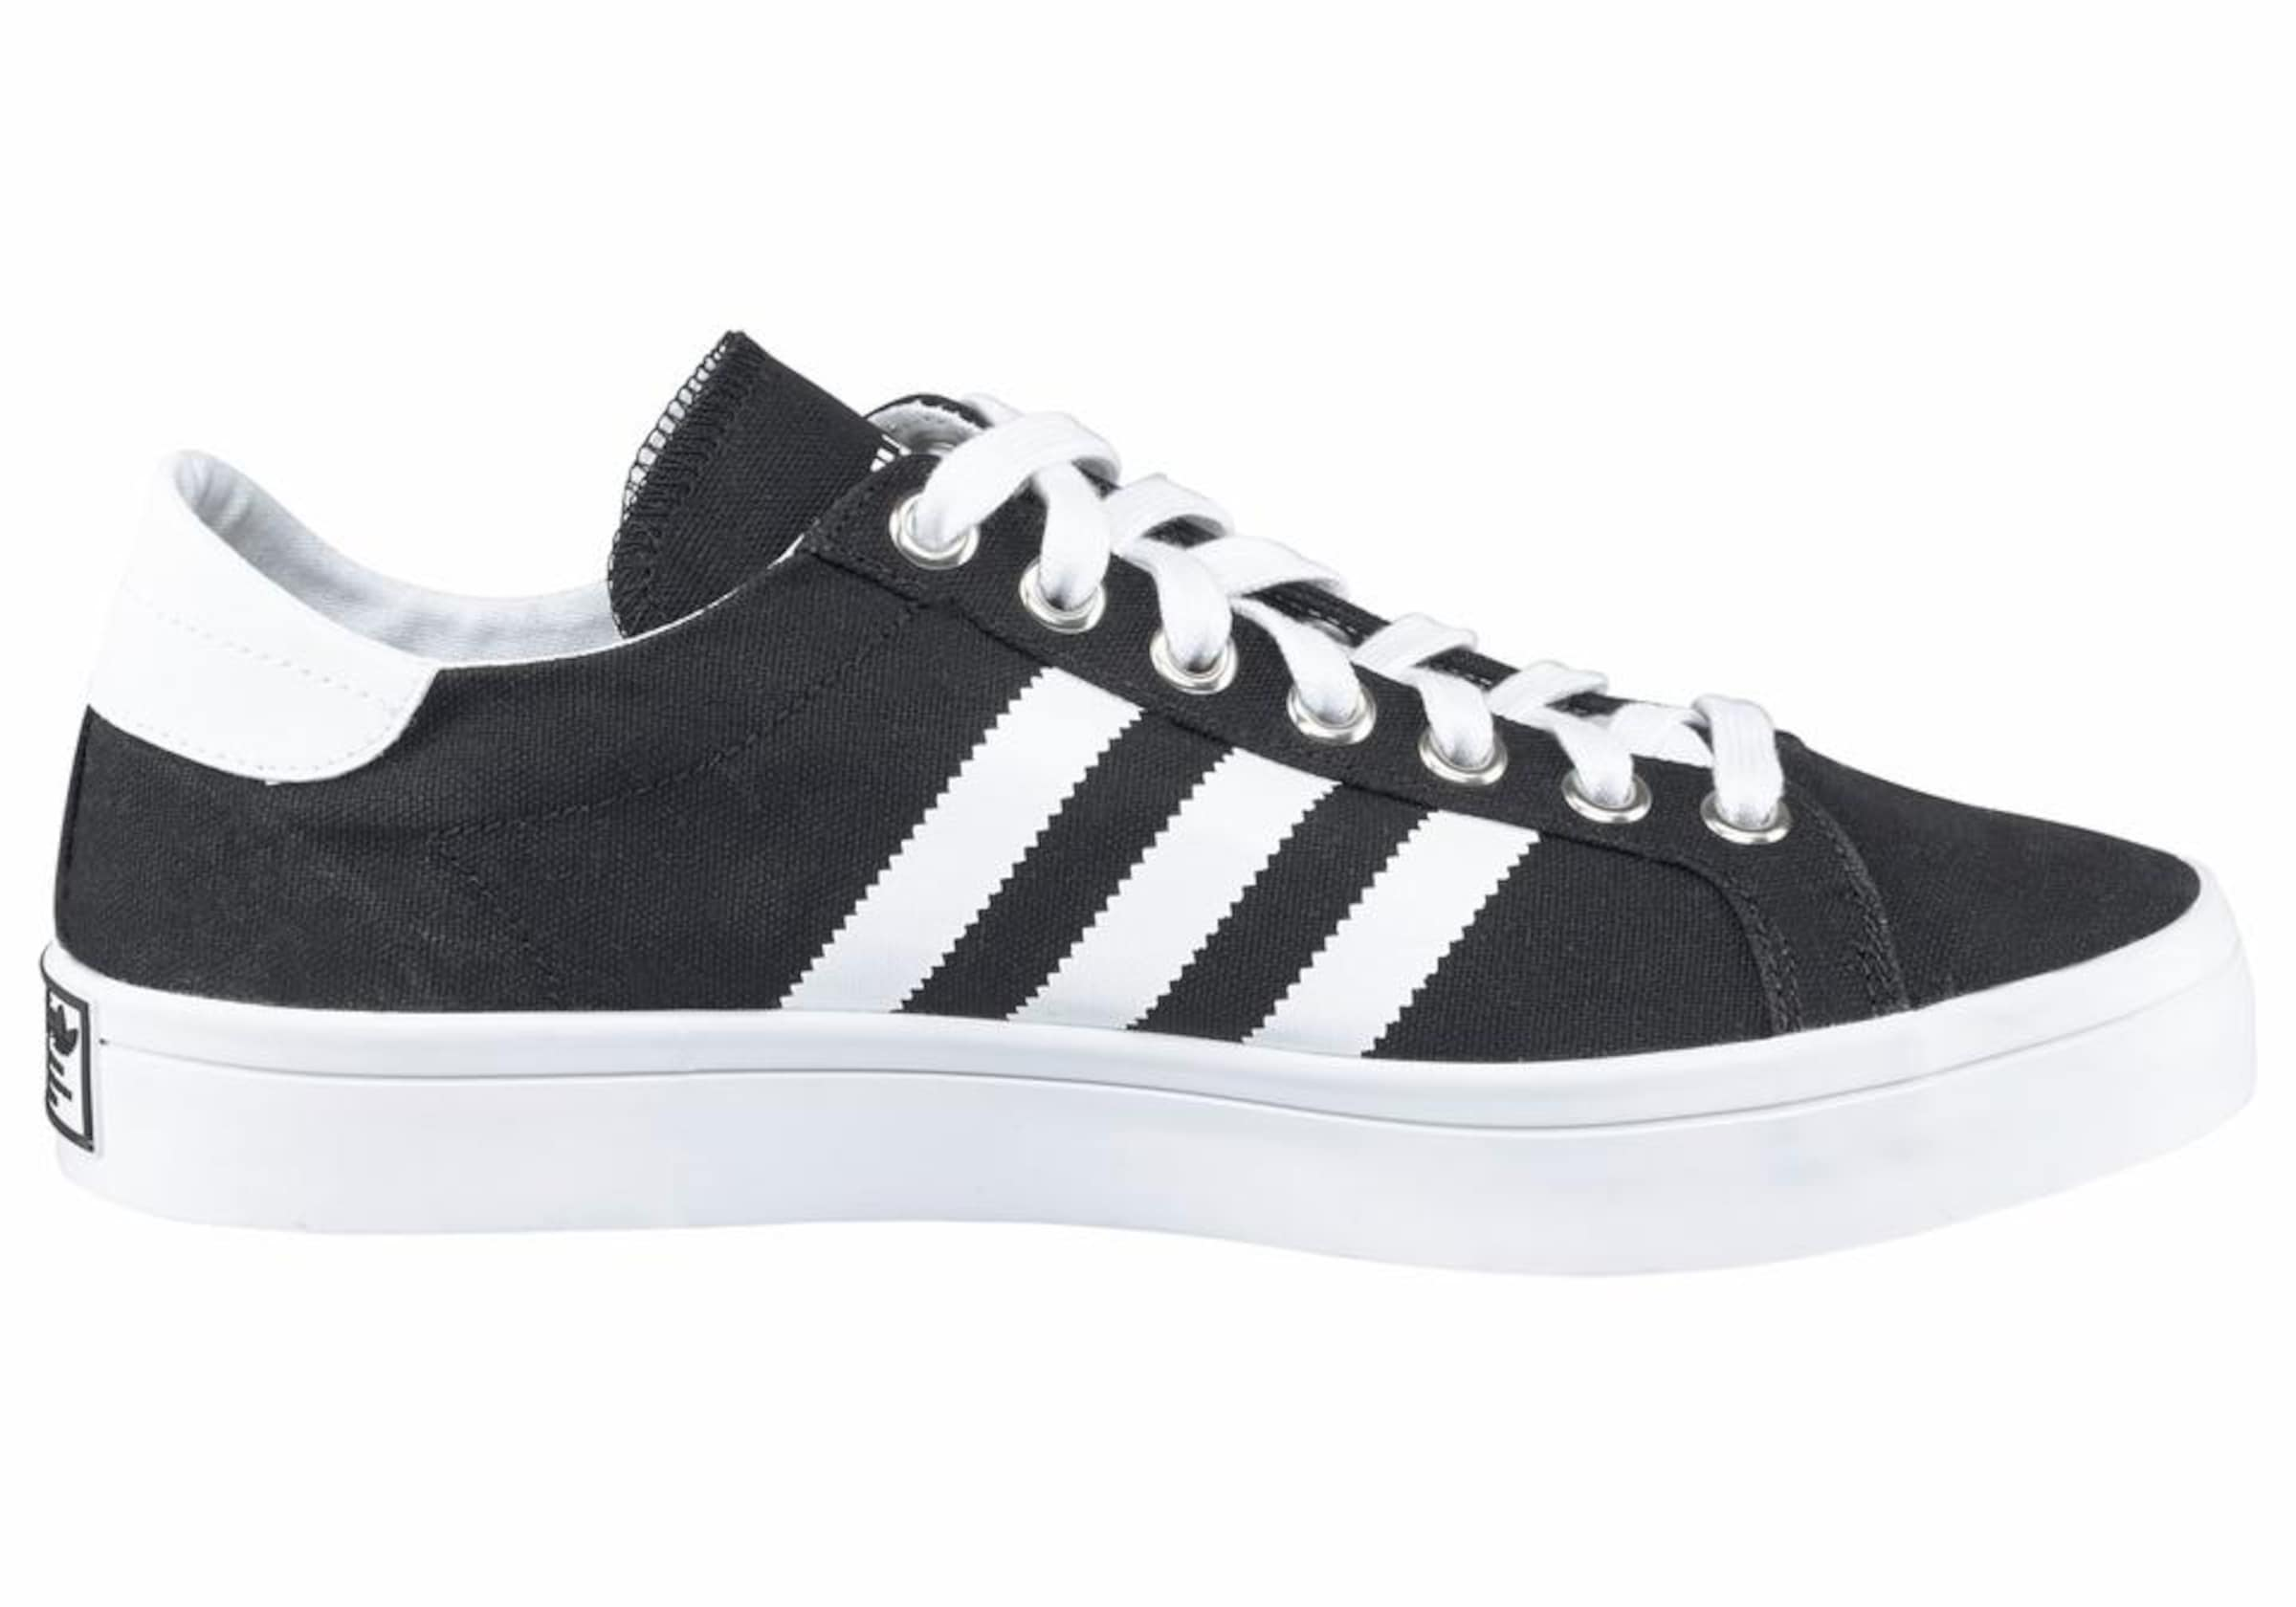 Rabatt Verkauf Online ADIDAS ORIGINALS Sneaker 'Court Vantage' 2018 Auslaß kuo5slz